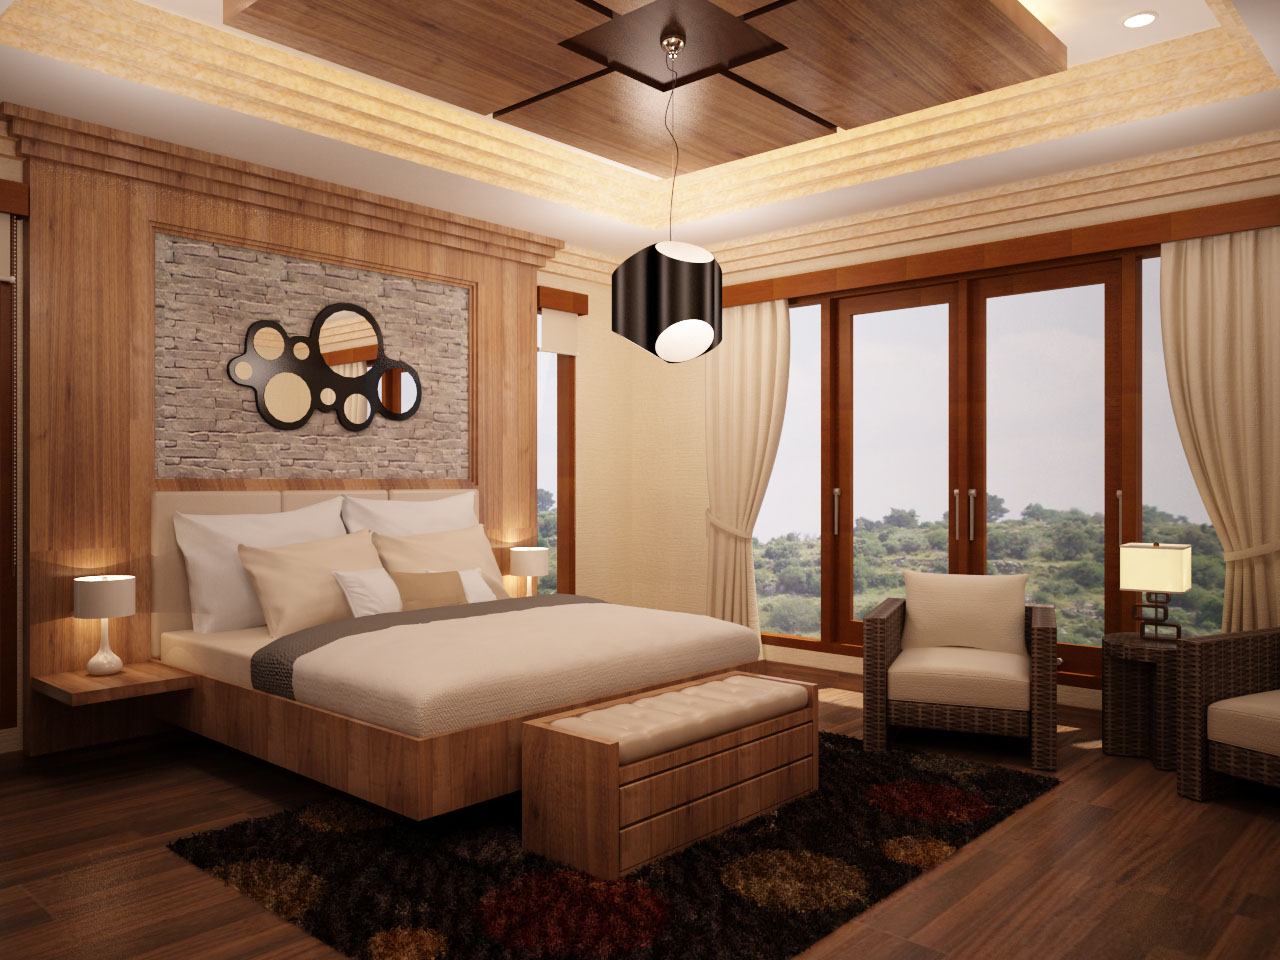 Batam-Bedroom-1-2.jpg